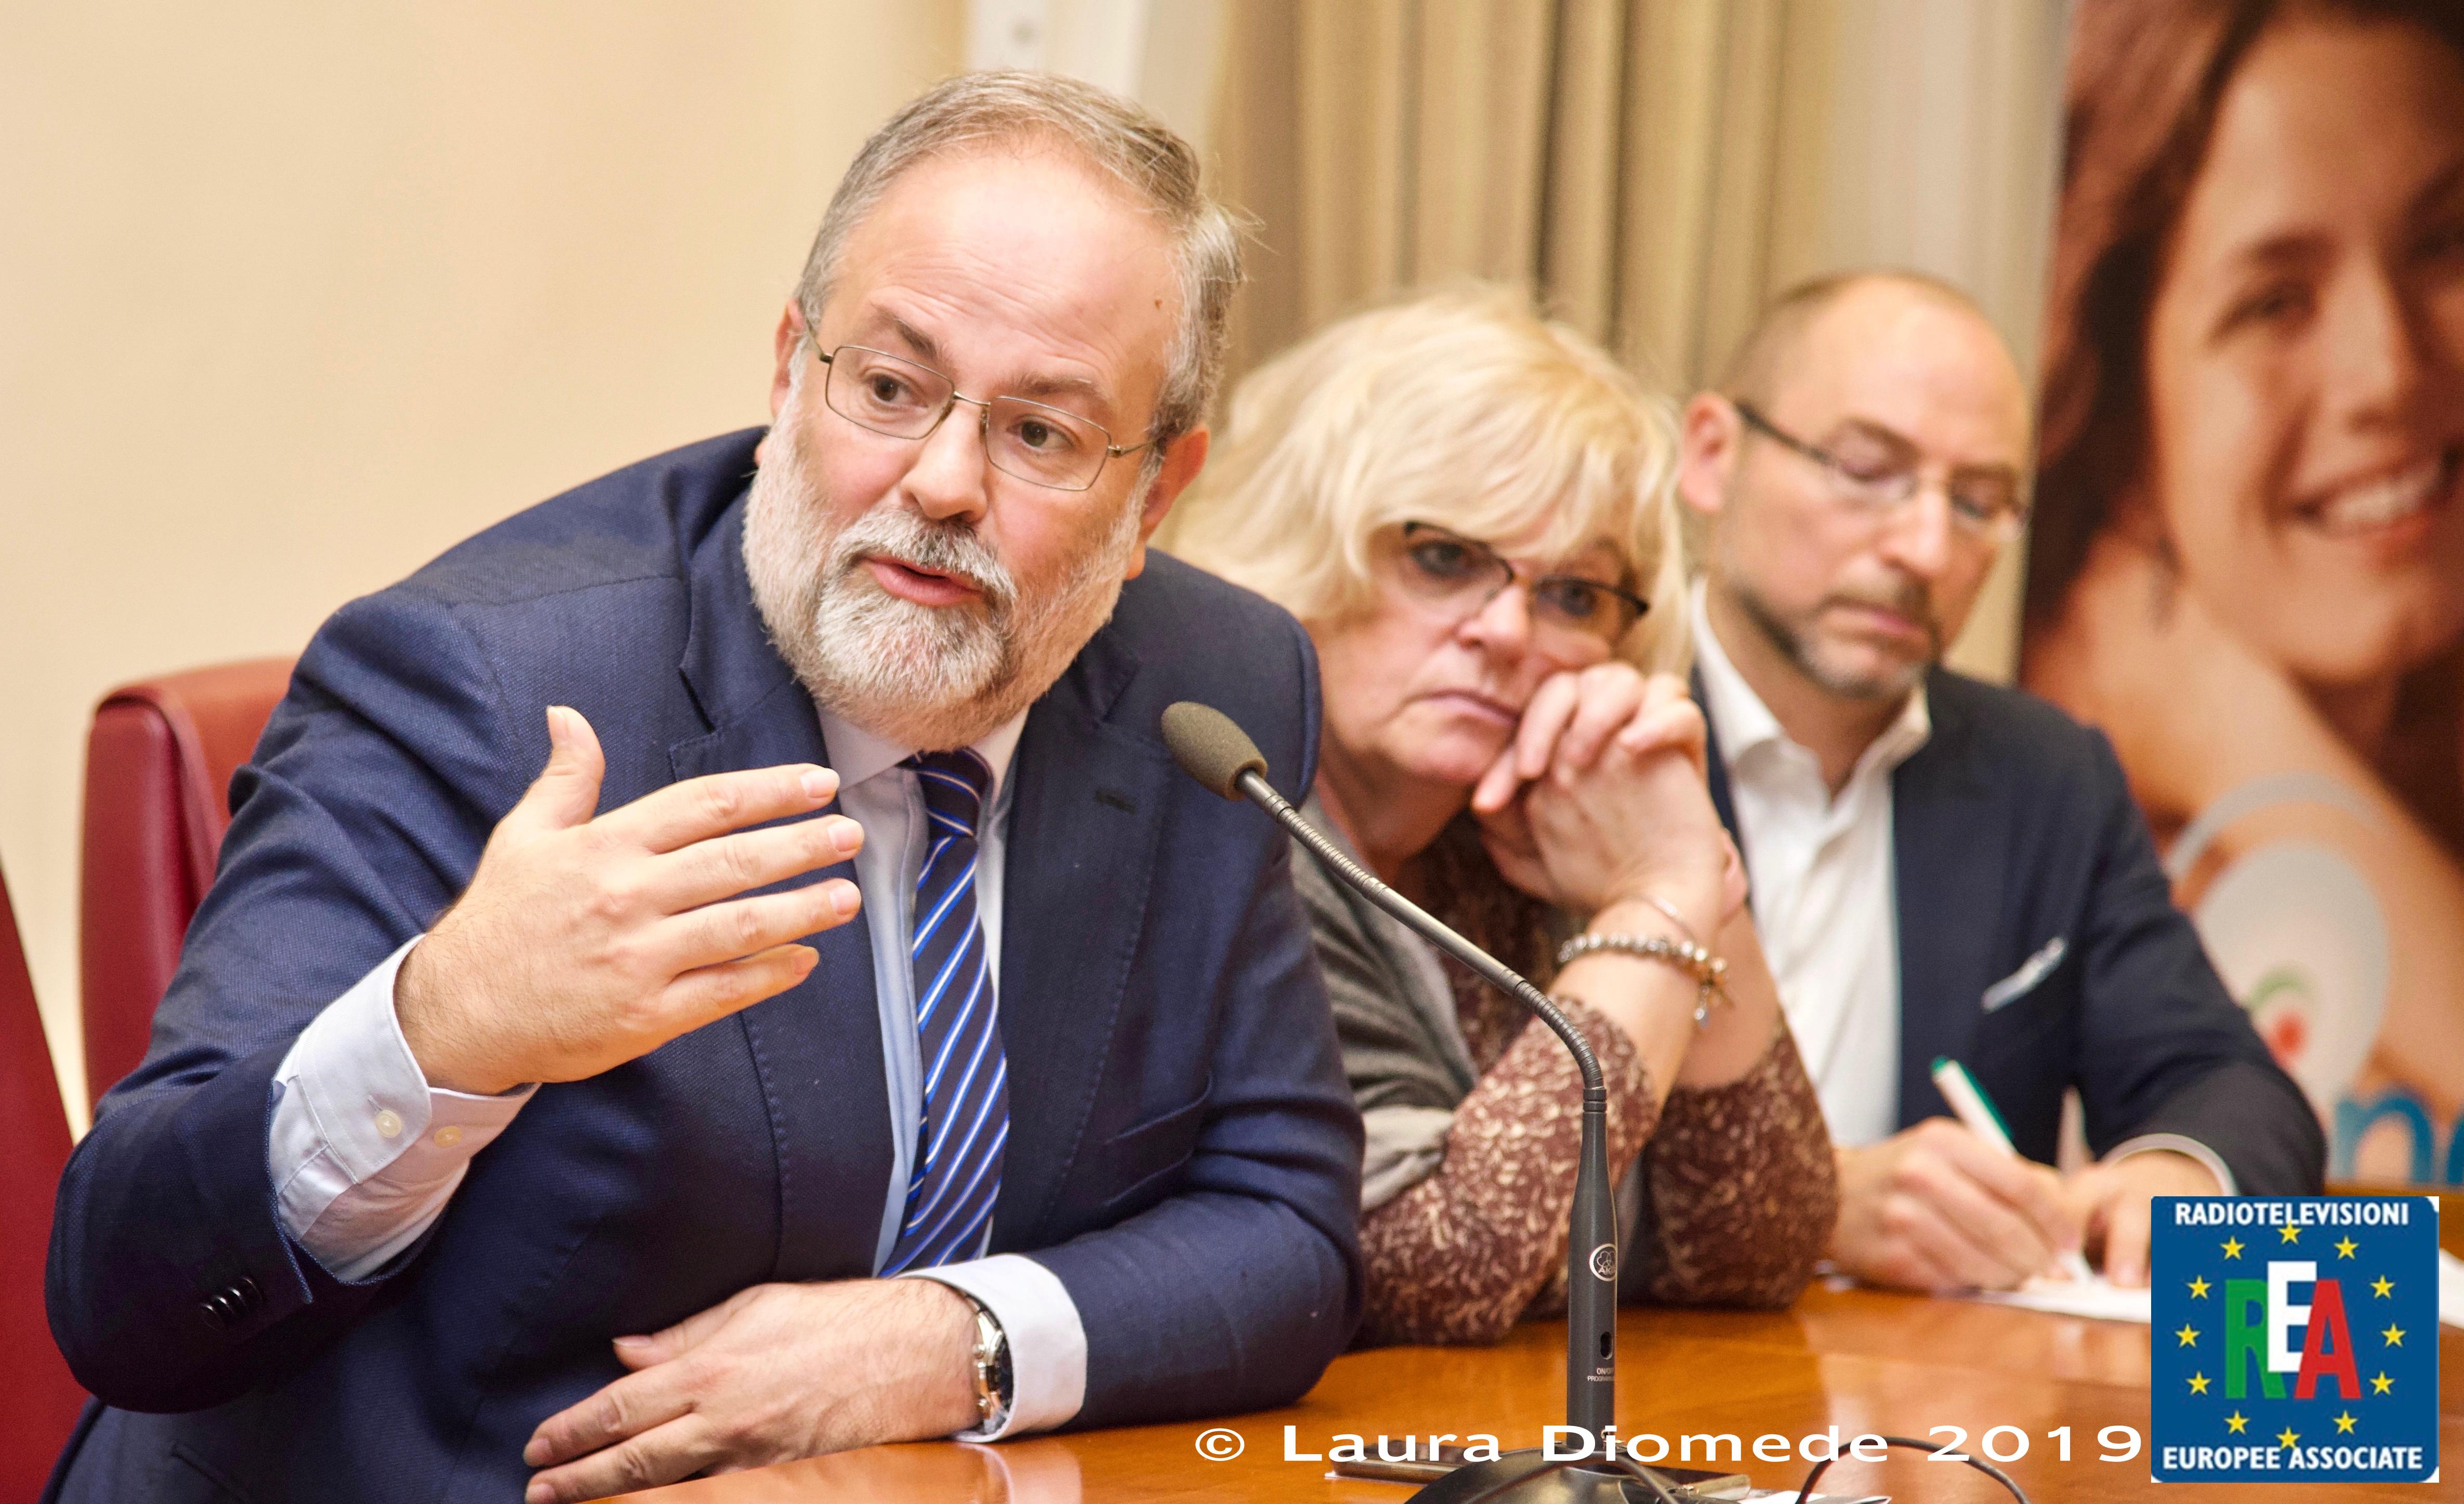 6 - Interviene il Dott. Enrico Finazzi Agrò - Past President SIUD